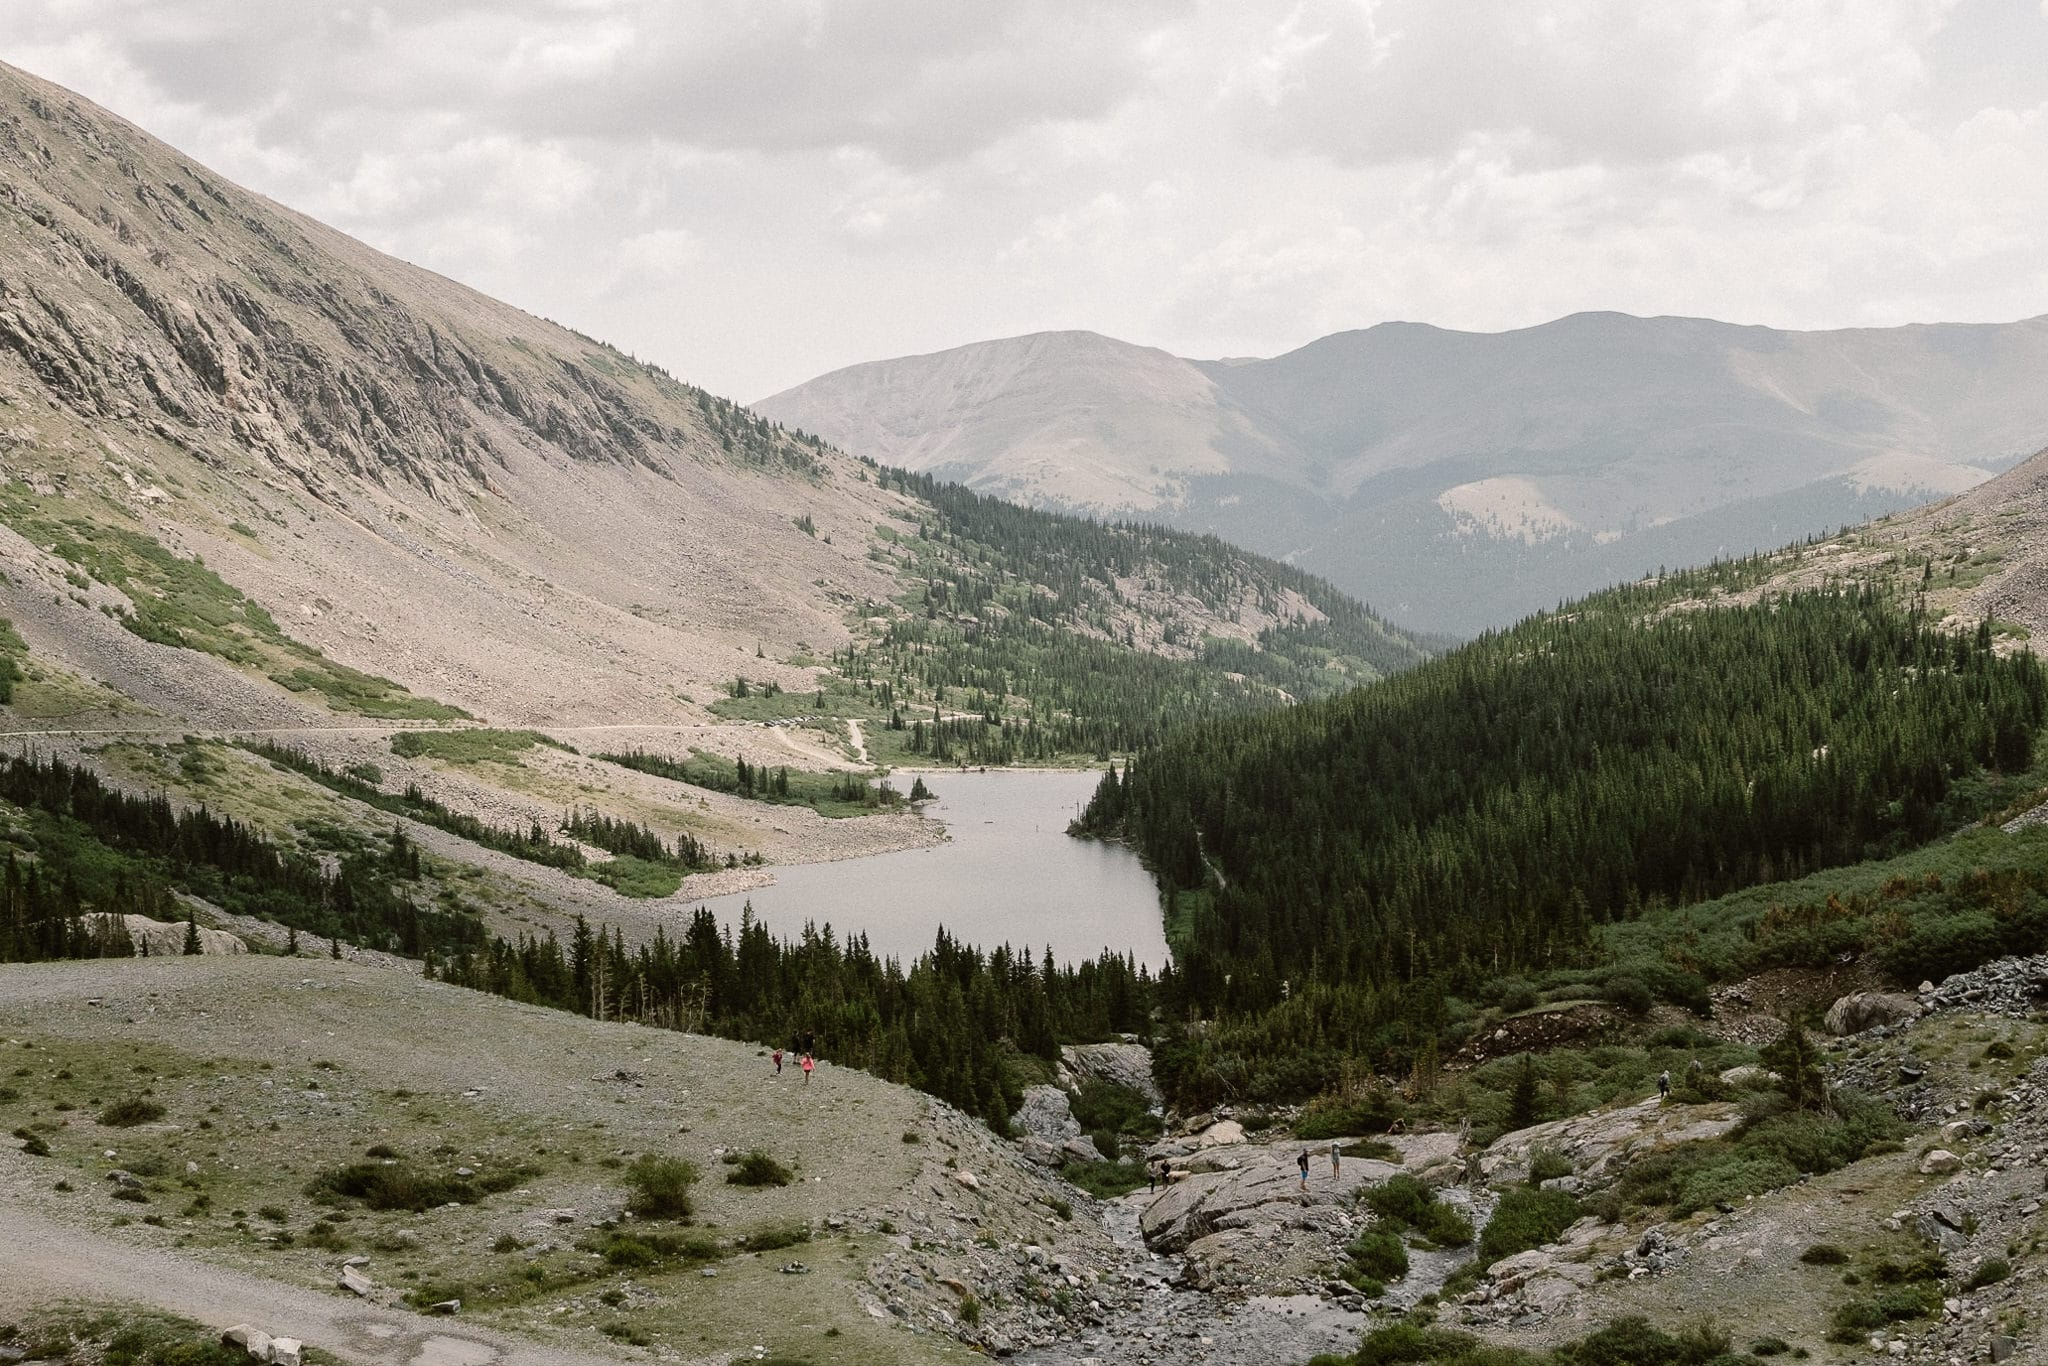 Breckenridge Elopement Locations, Colorado adventure wedding photographer, alpine lakes, mountain hike